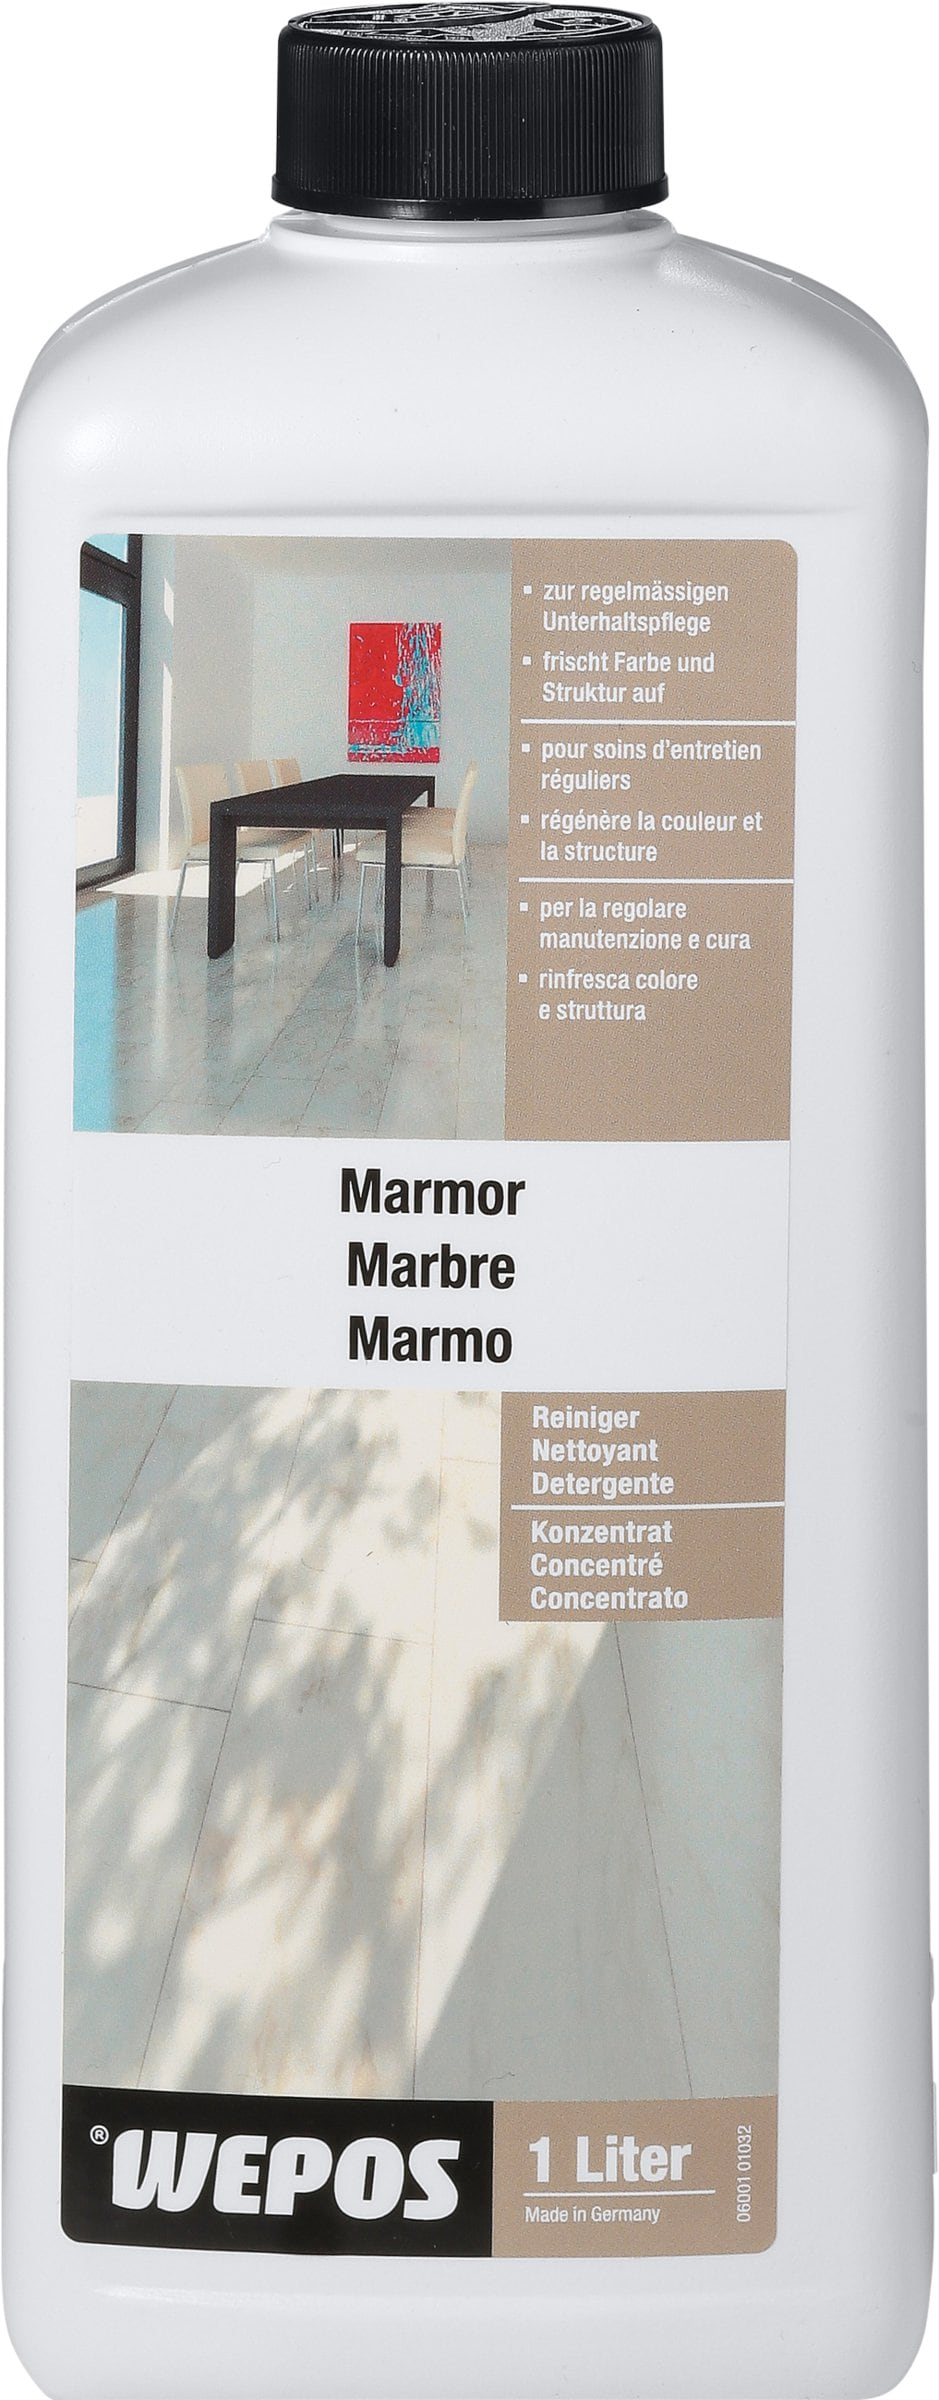 wepos marmor reiniger konzentrat migros. Black Bedroom Furniture Sets. Home Design Ideas